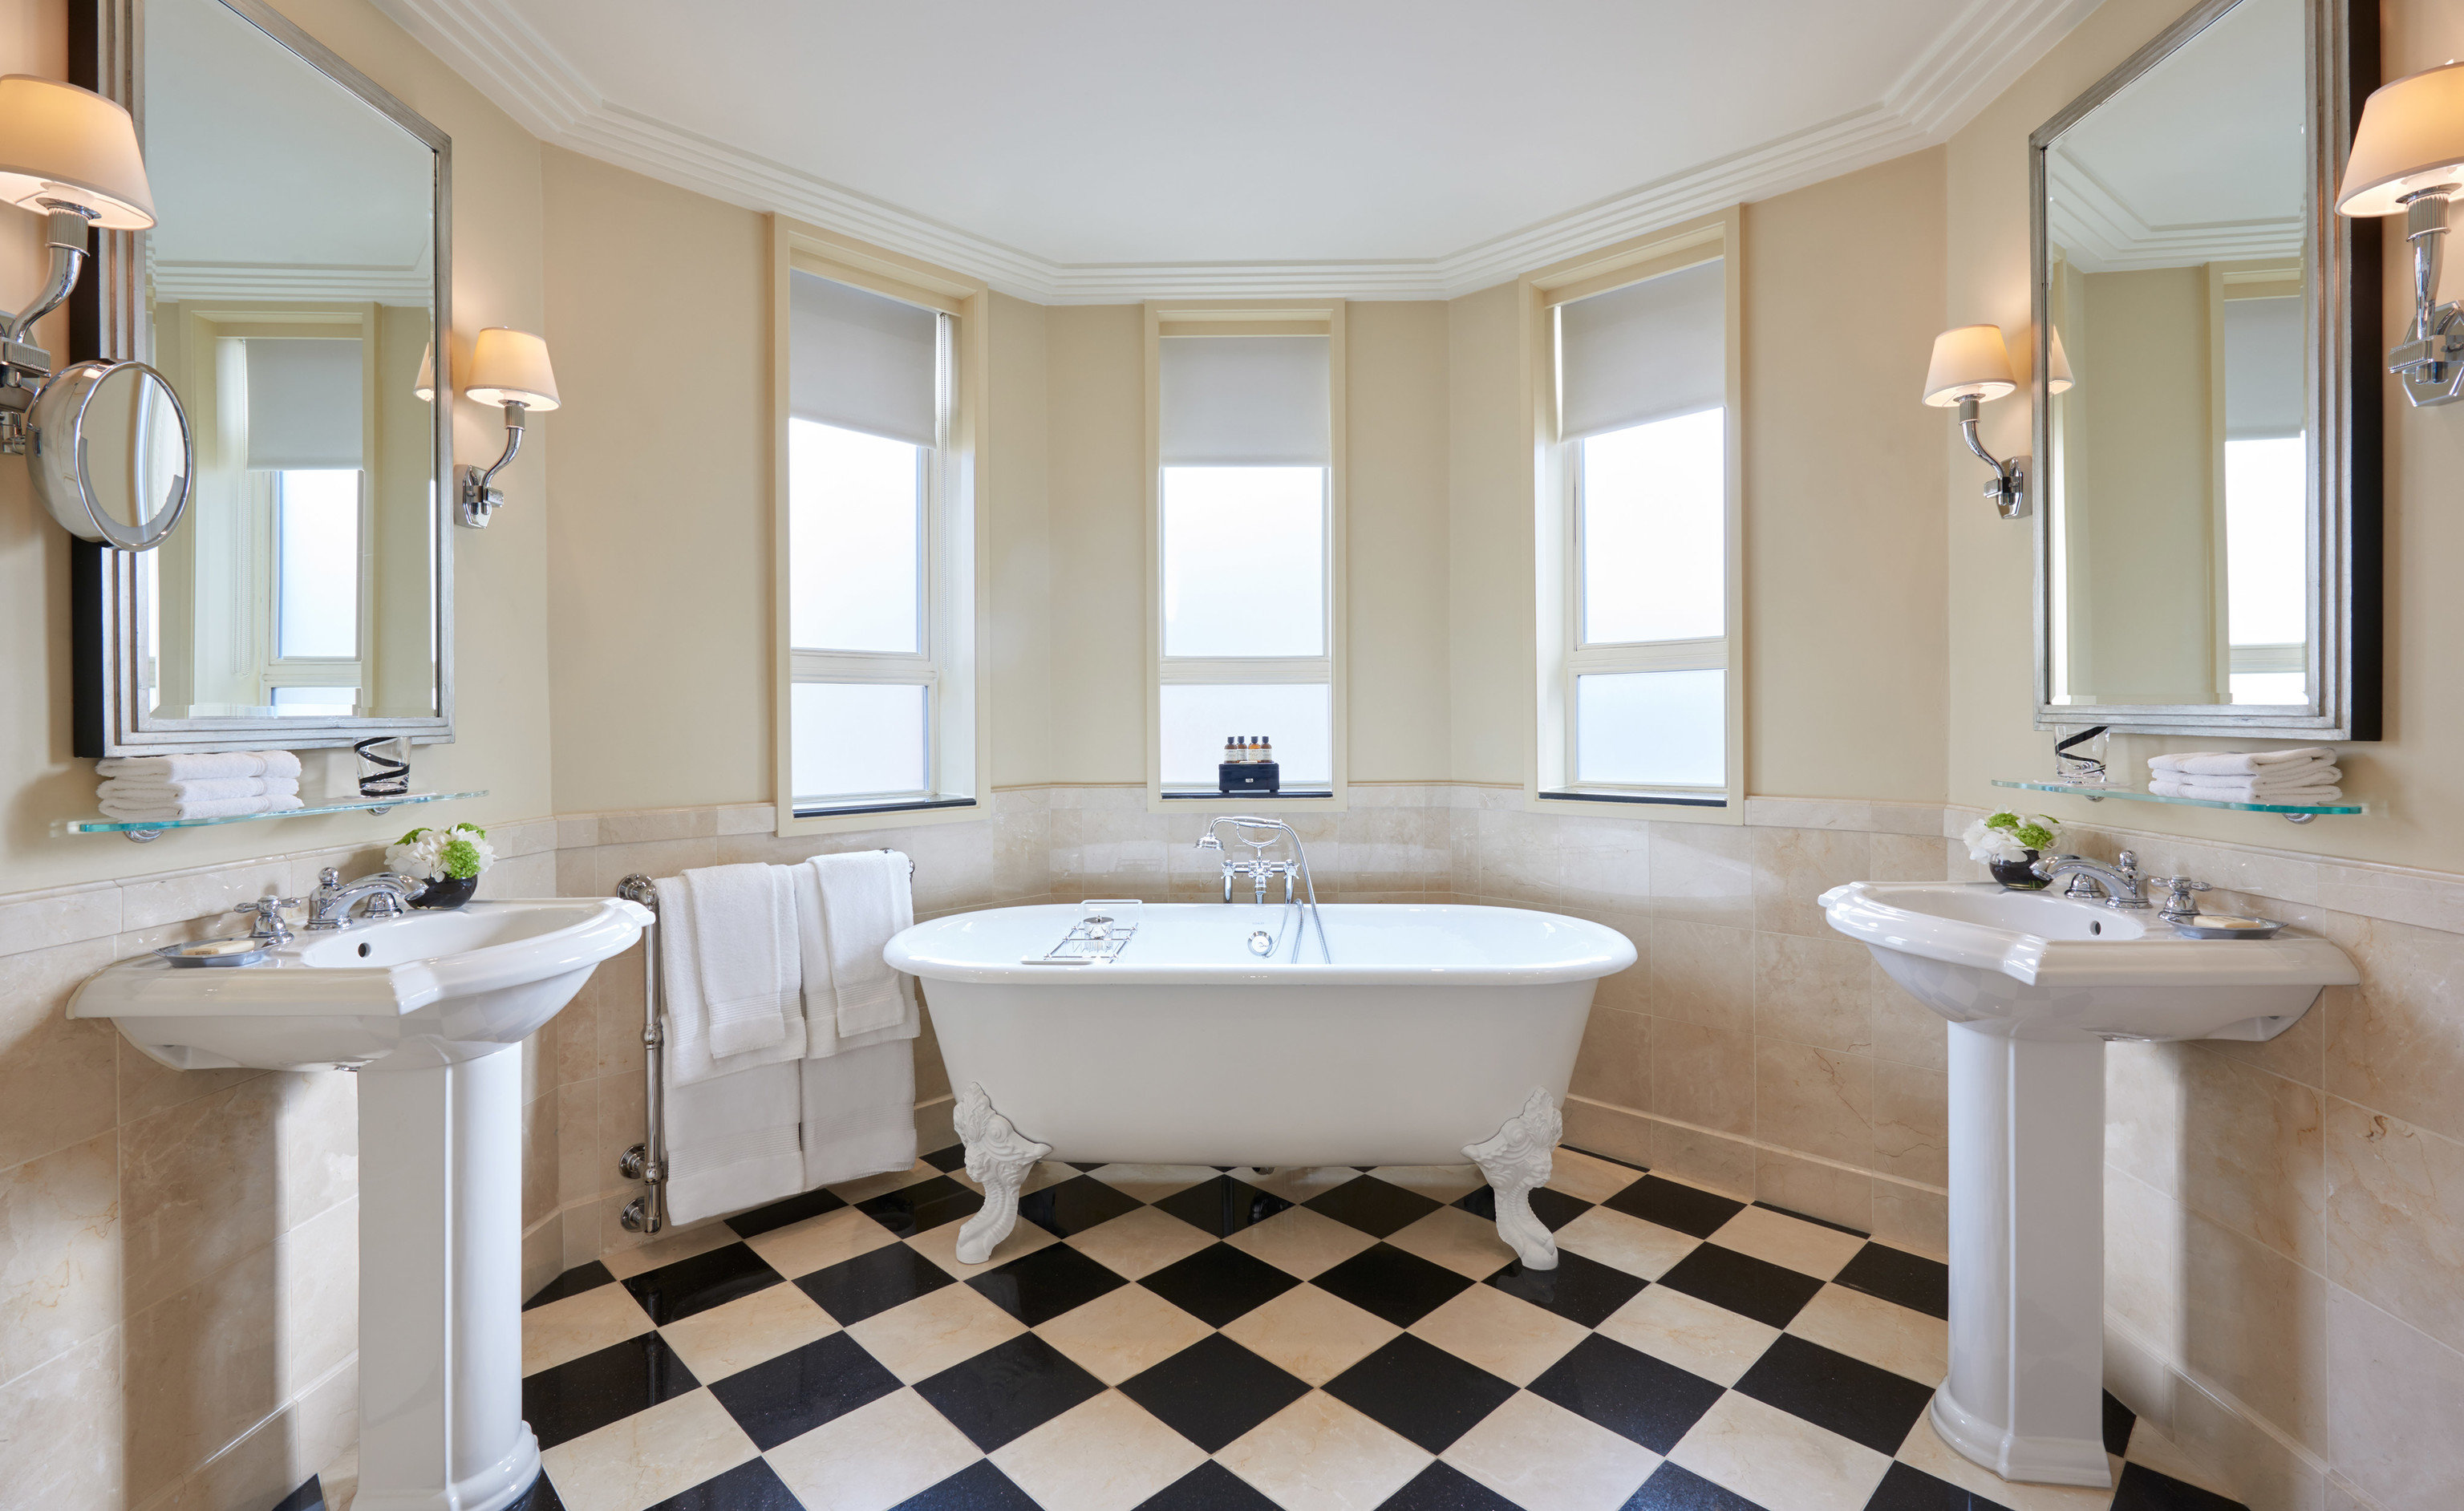 bathroom sink tub property bathtub home tile white Bath Suite tiled flooring cottage